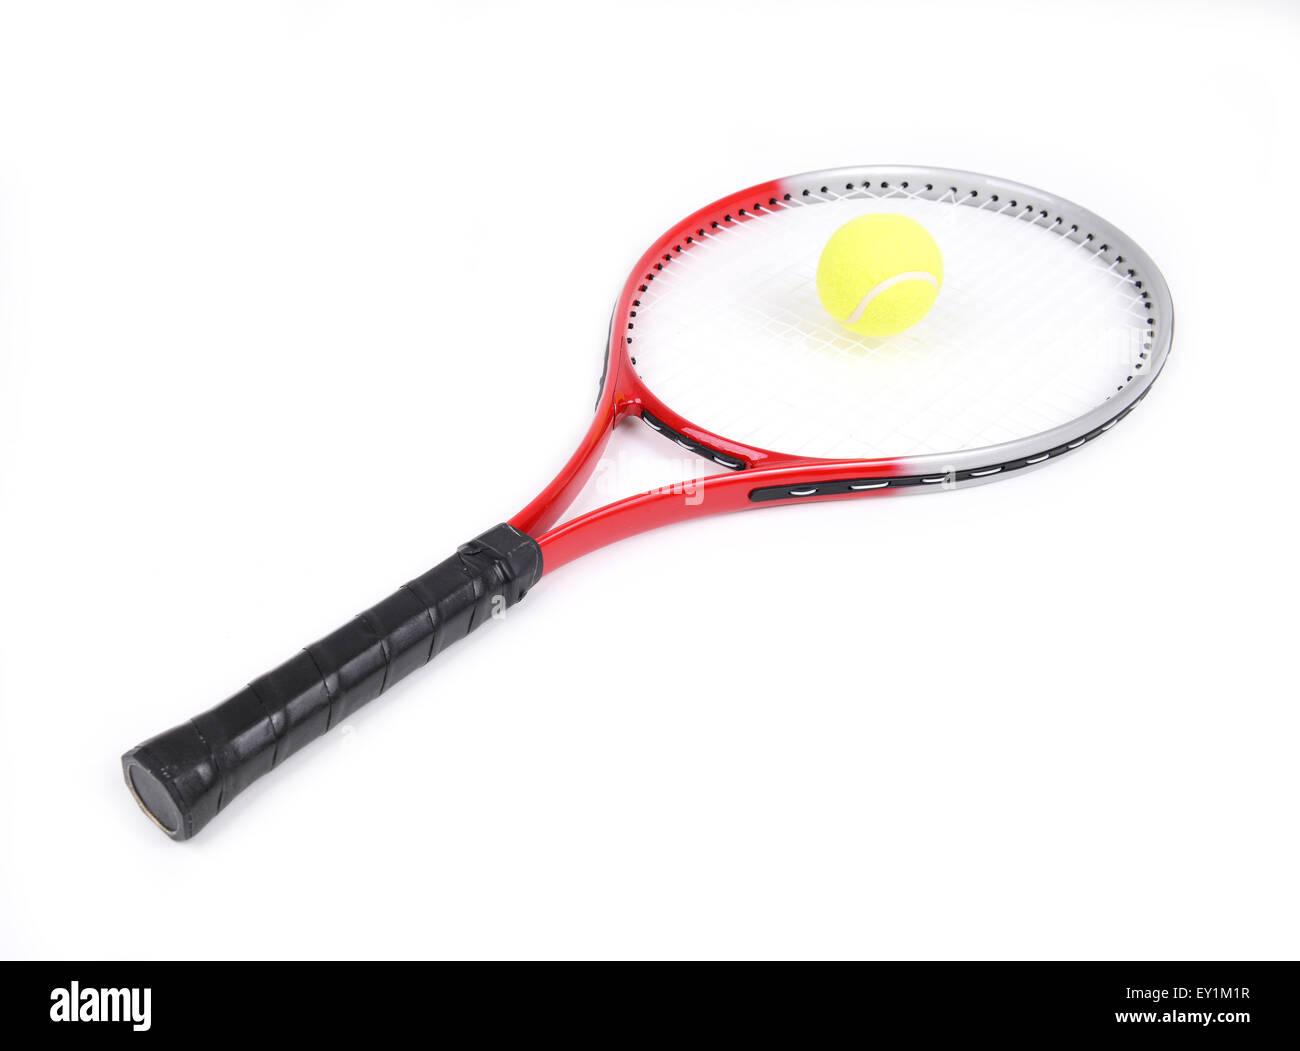 tennis racket isolated on  white background - Stock Image